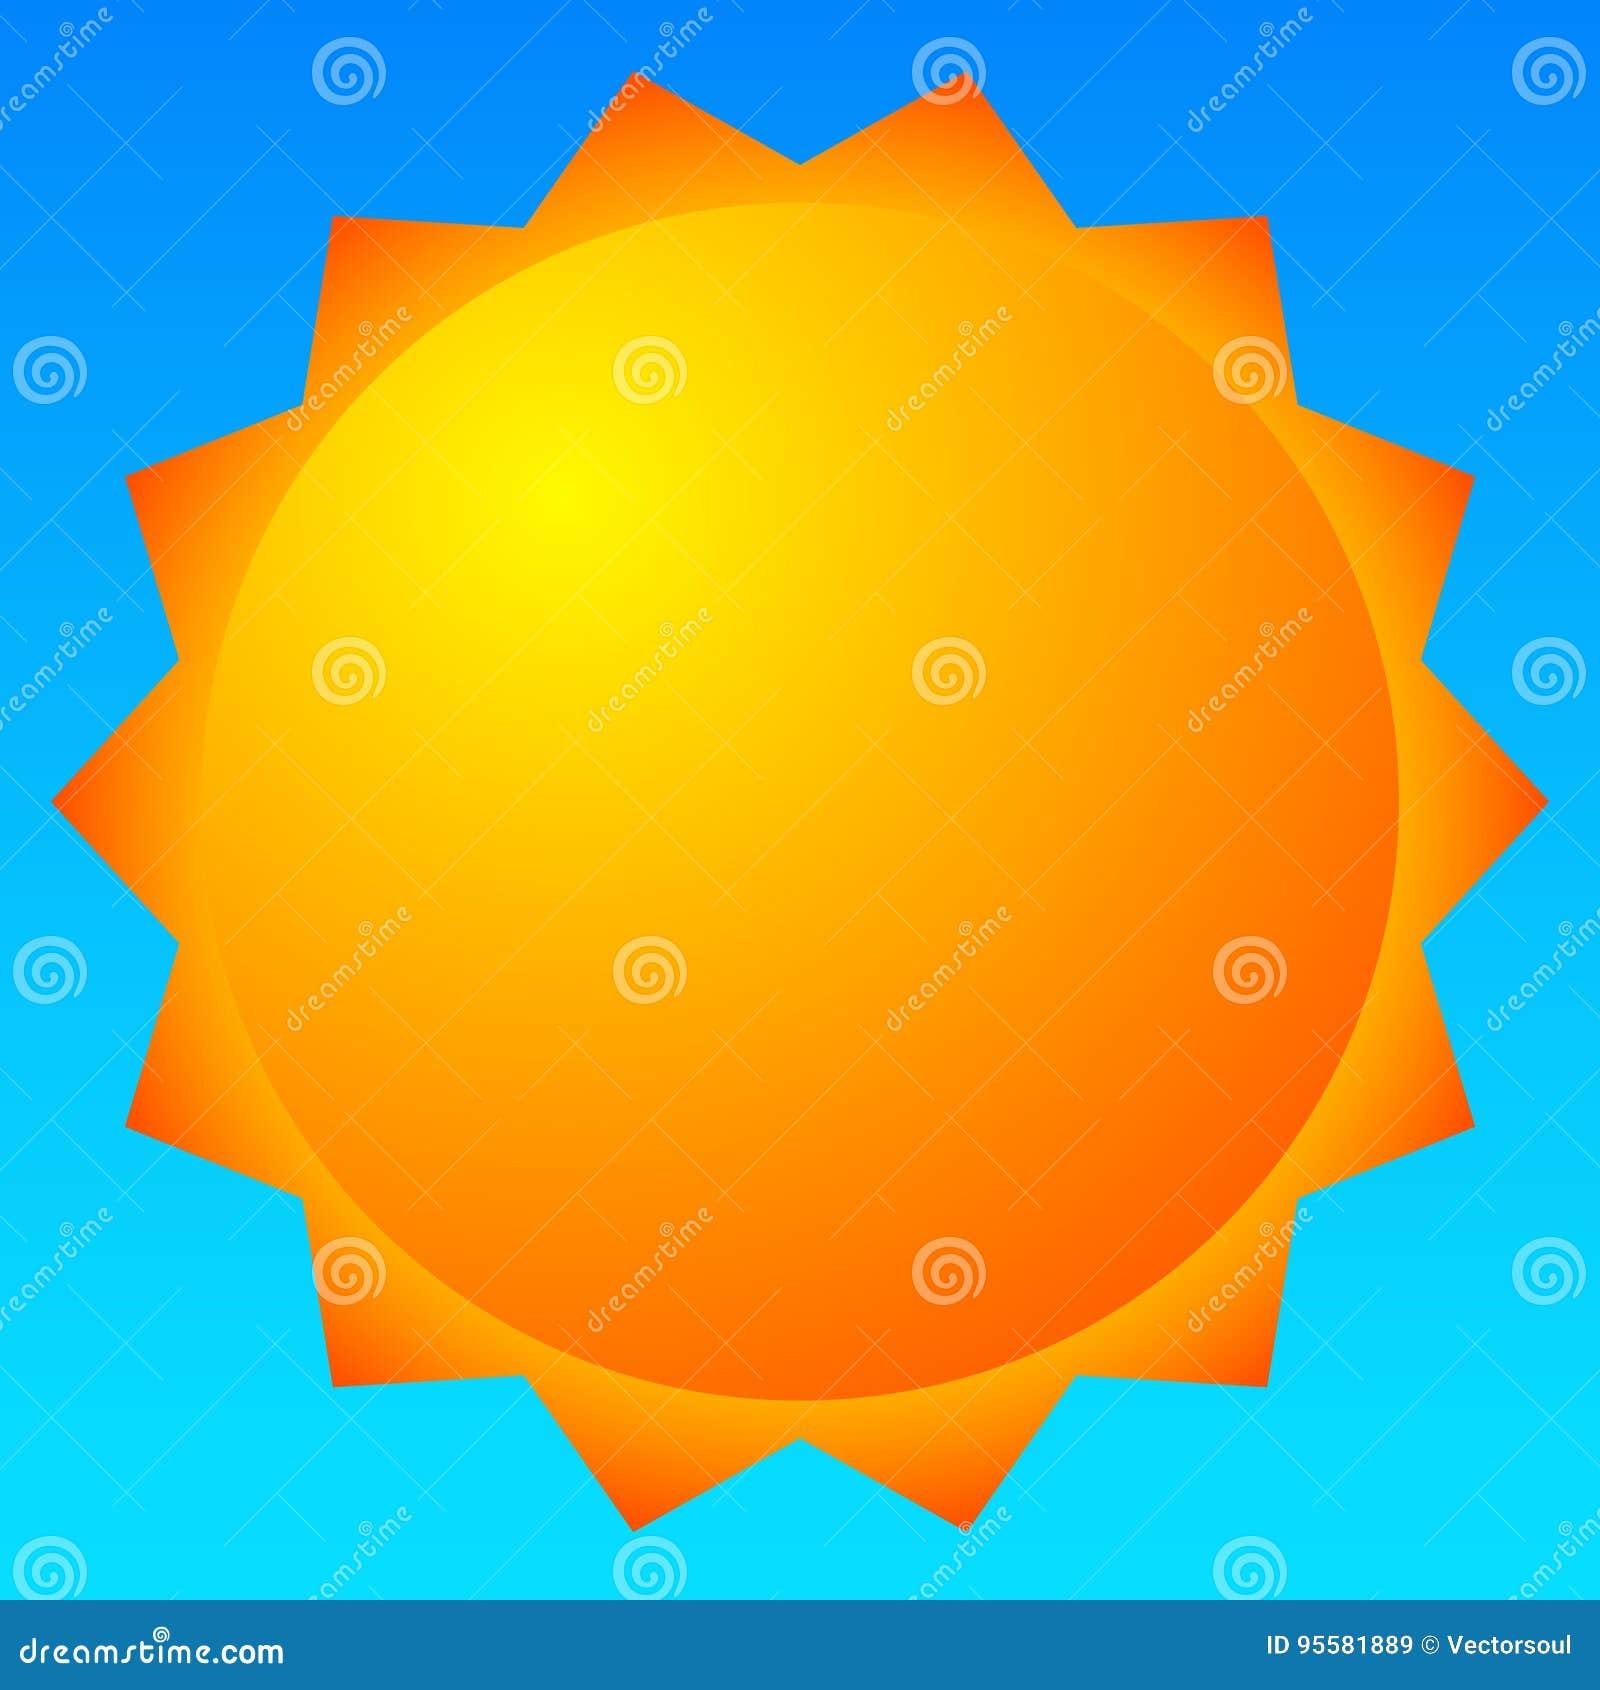 Sun Vector Clip-art  Sun Illustration For Weather, Summer